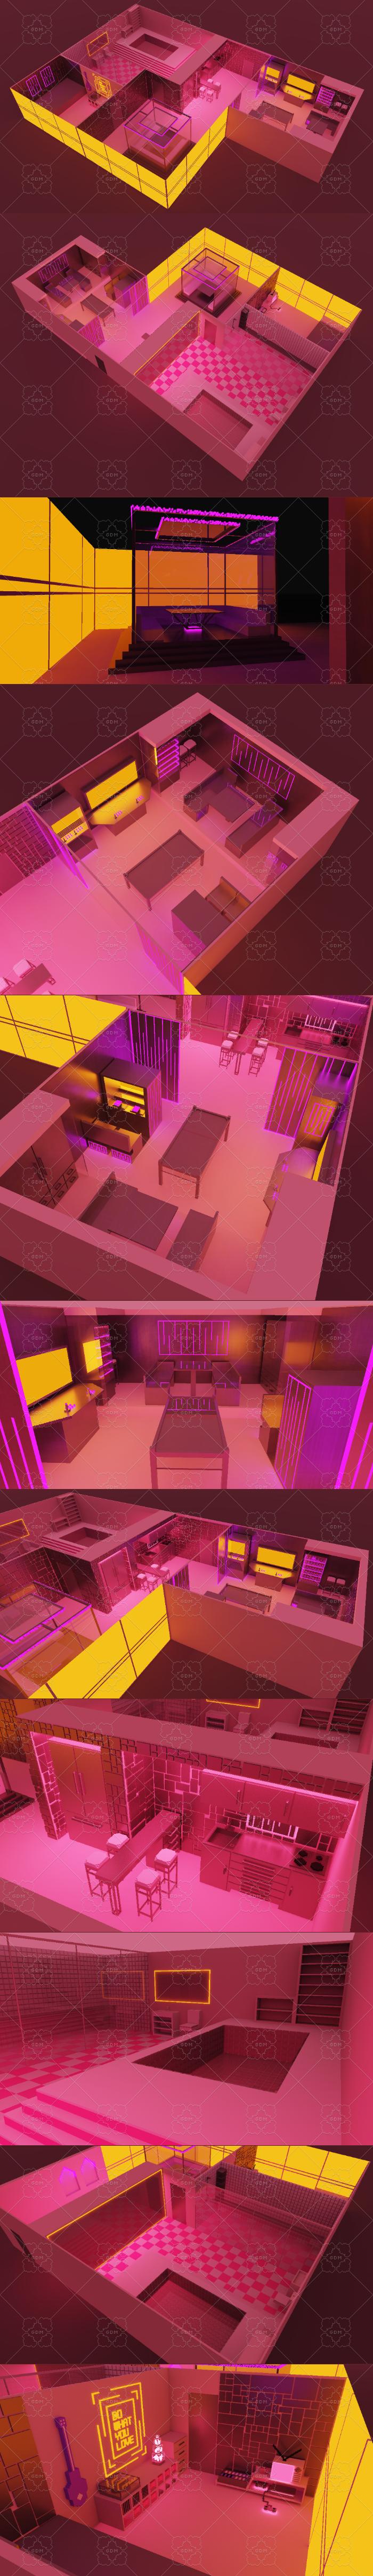 3D neon apartment in retro futurism style